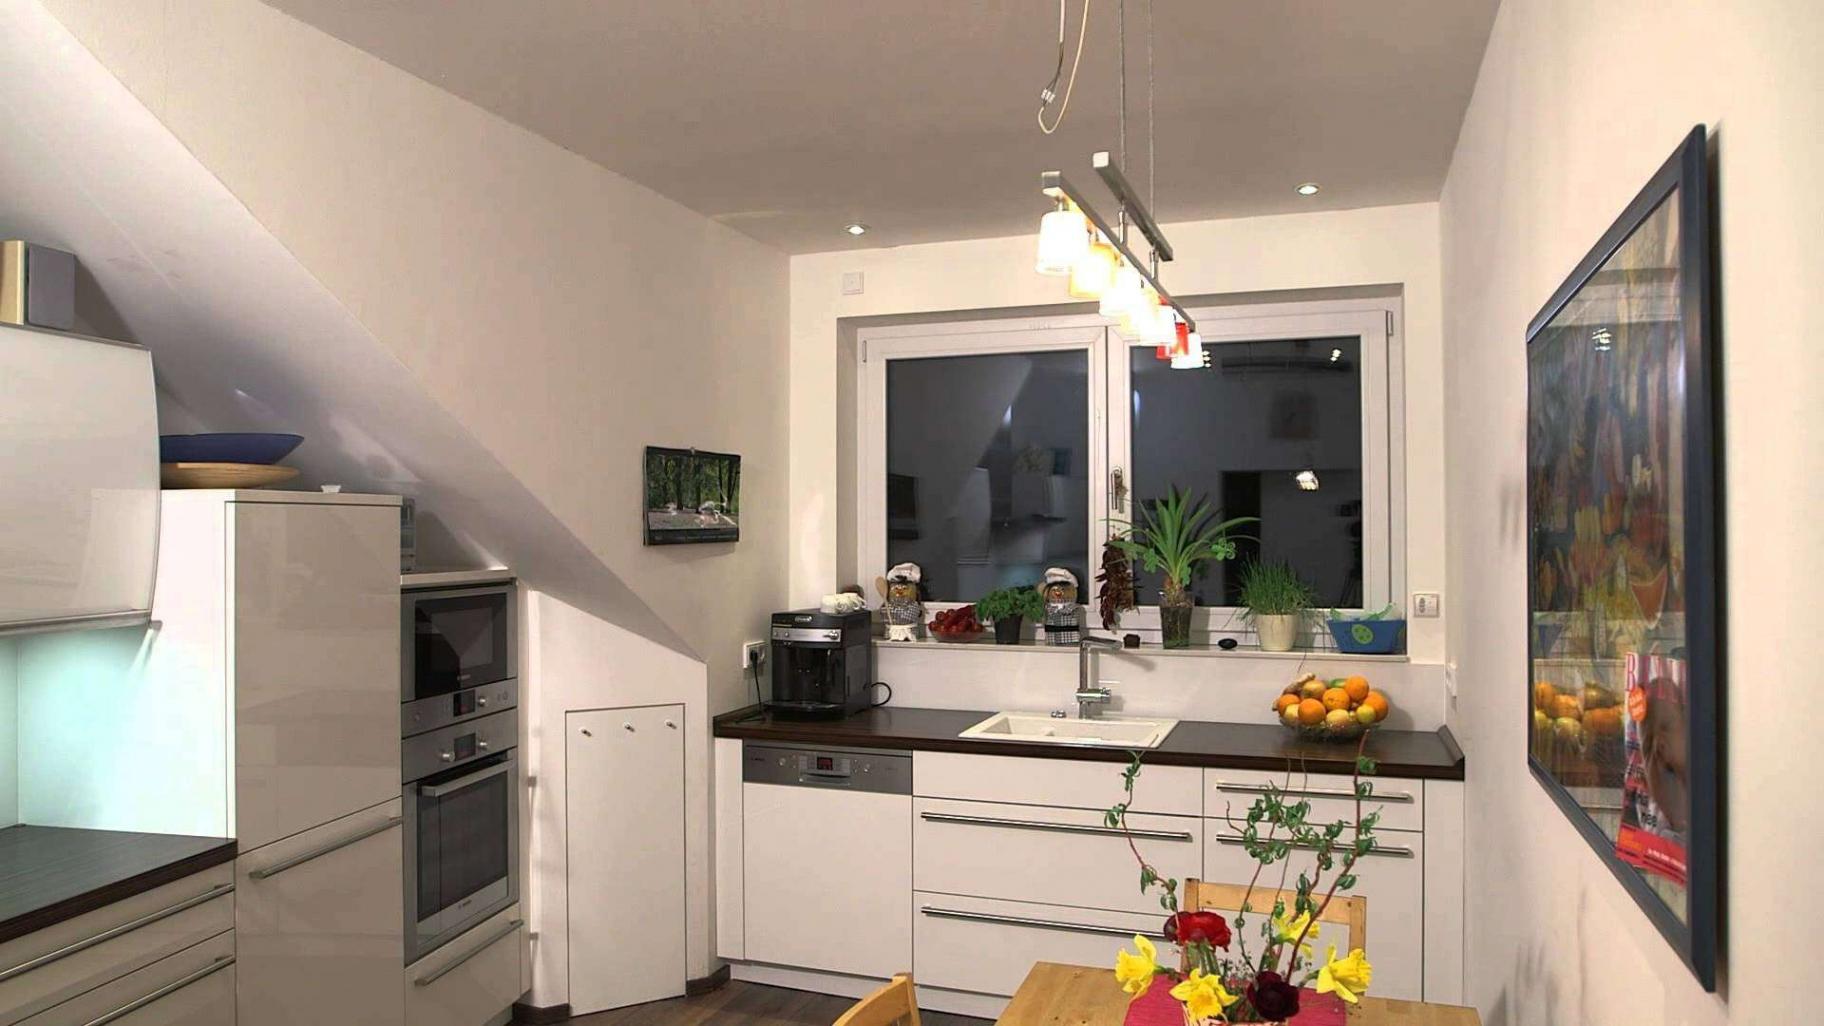 45 luxus deko ideen kuche galerie kuchen fur dachgeschosswohnungen kuchen fur dachgeschosswohnungen 4